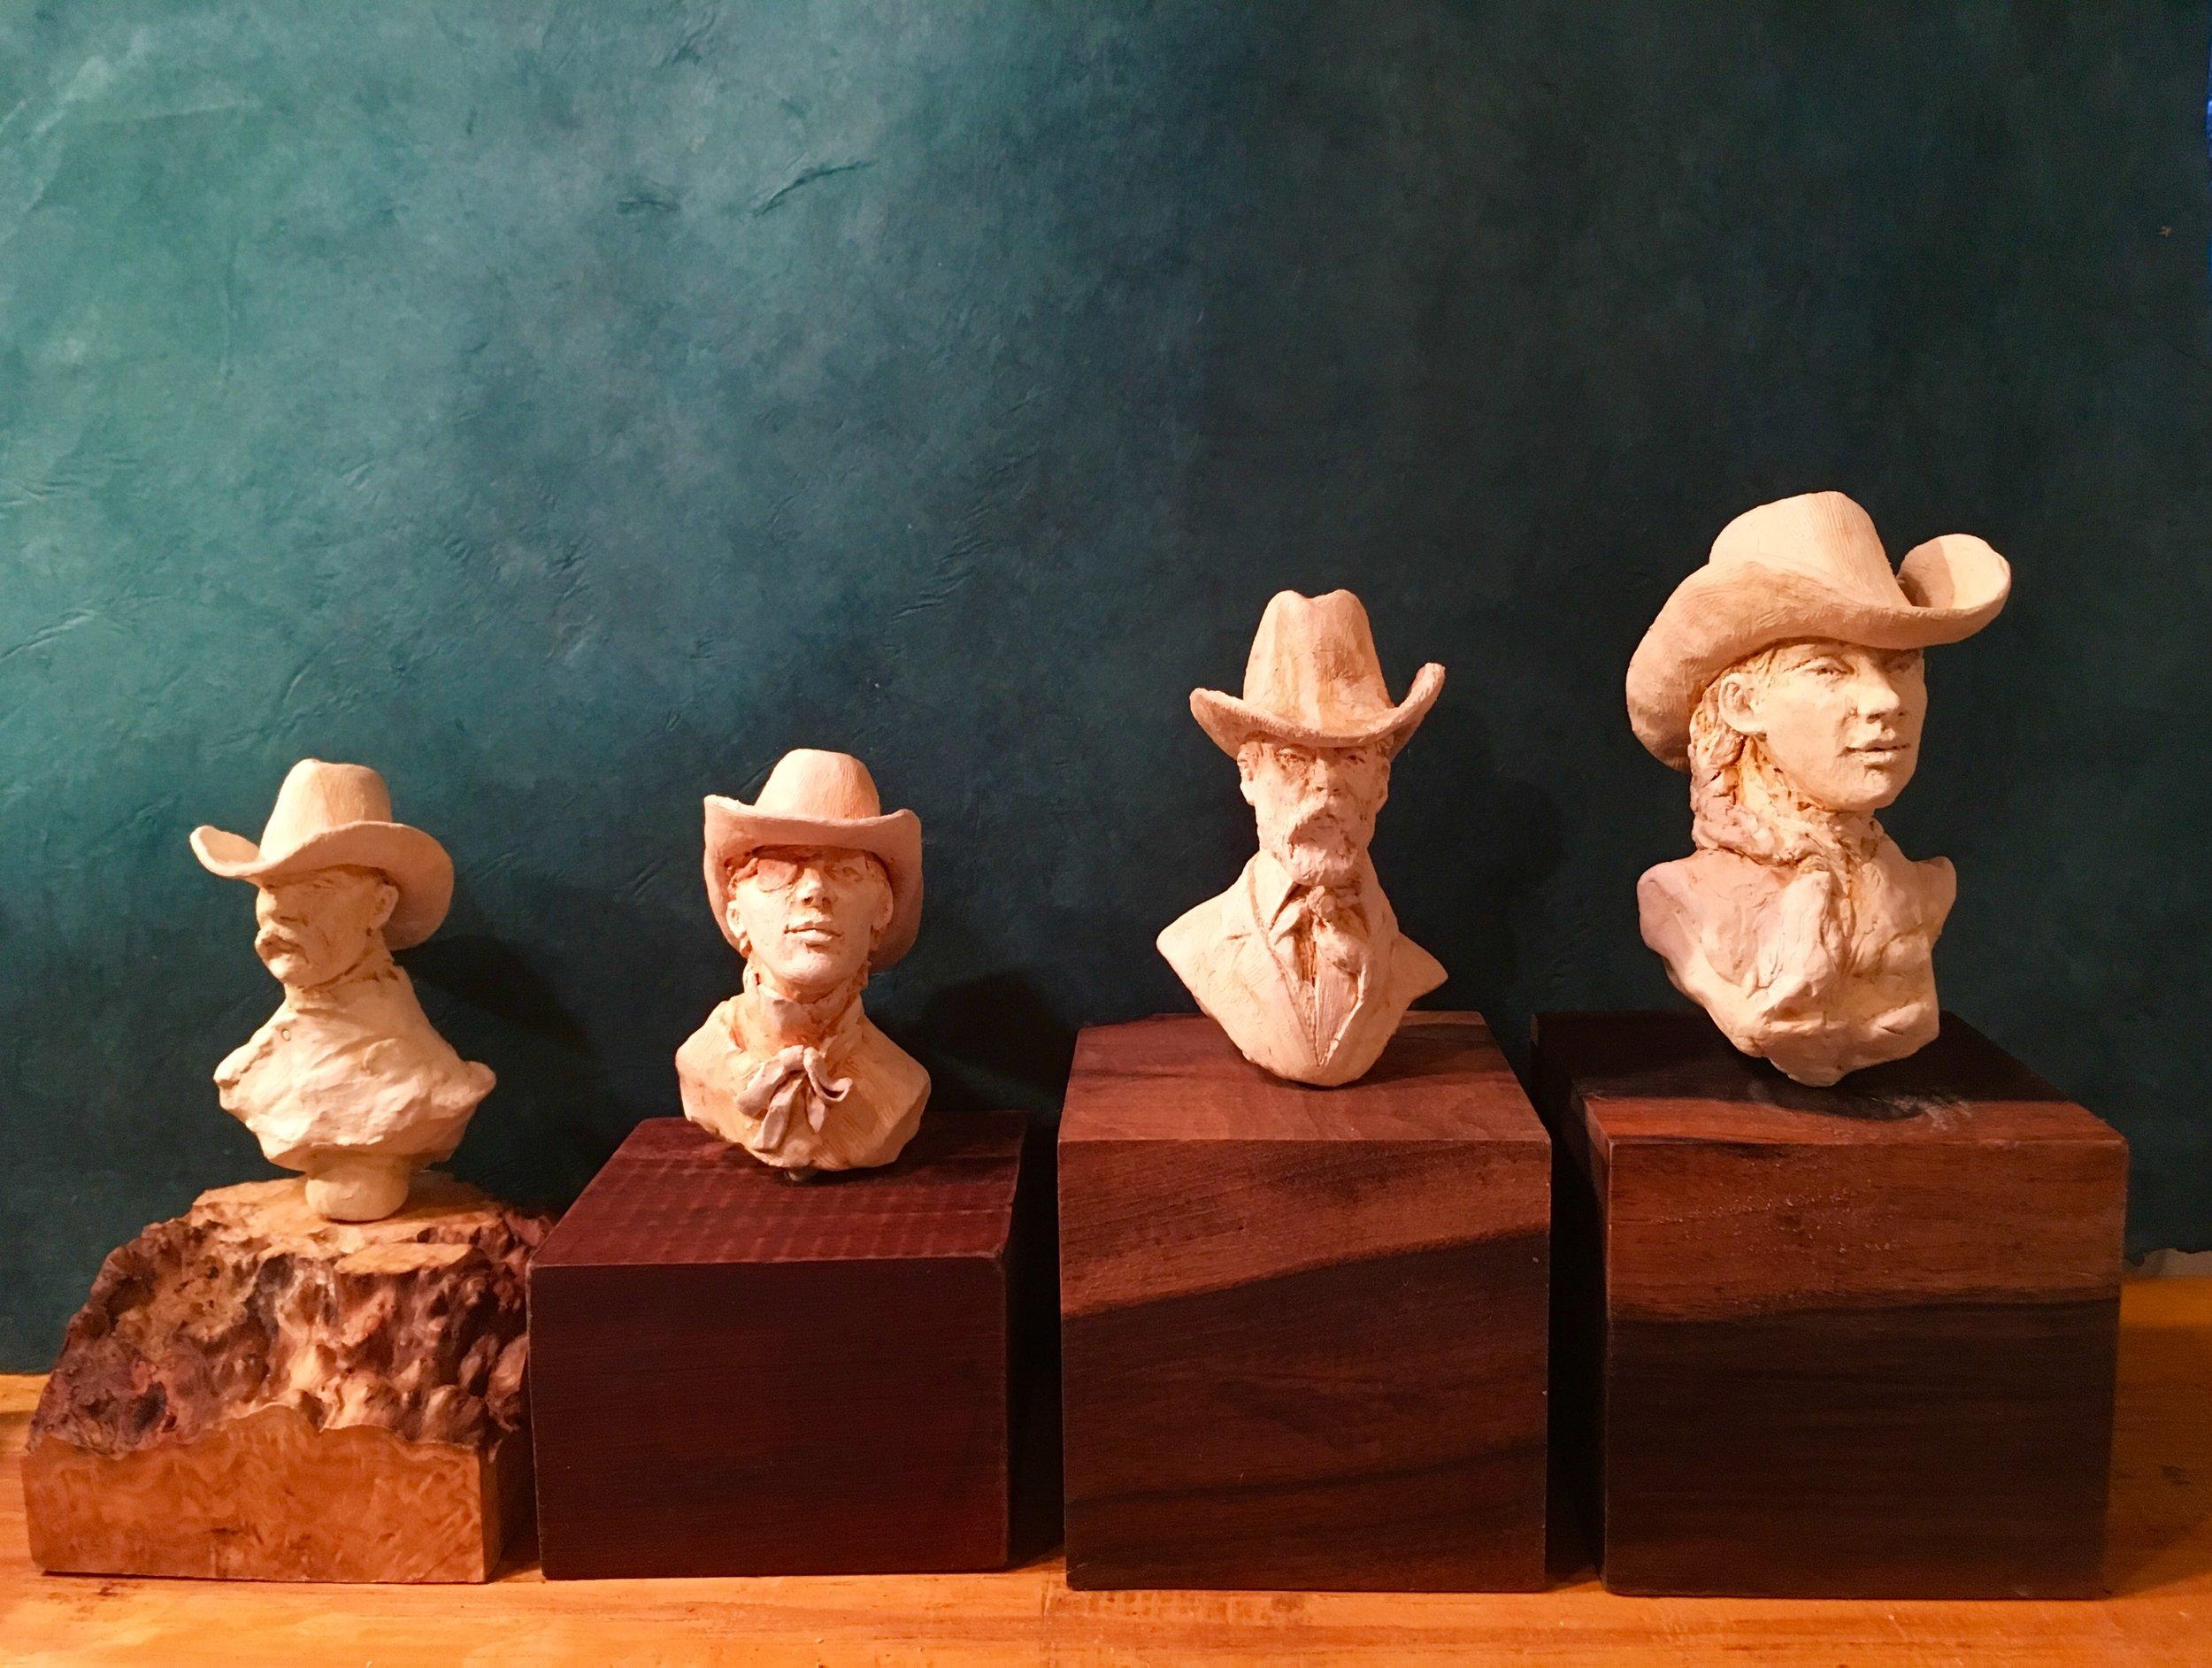 Ceramic Cowboys and Girls